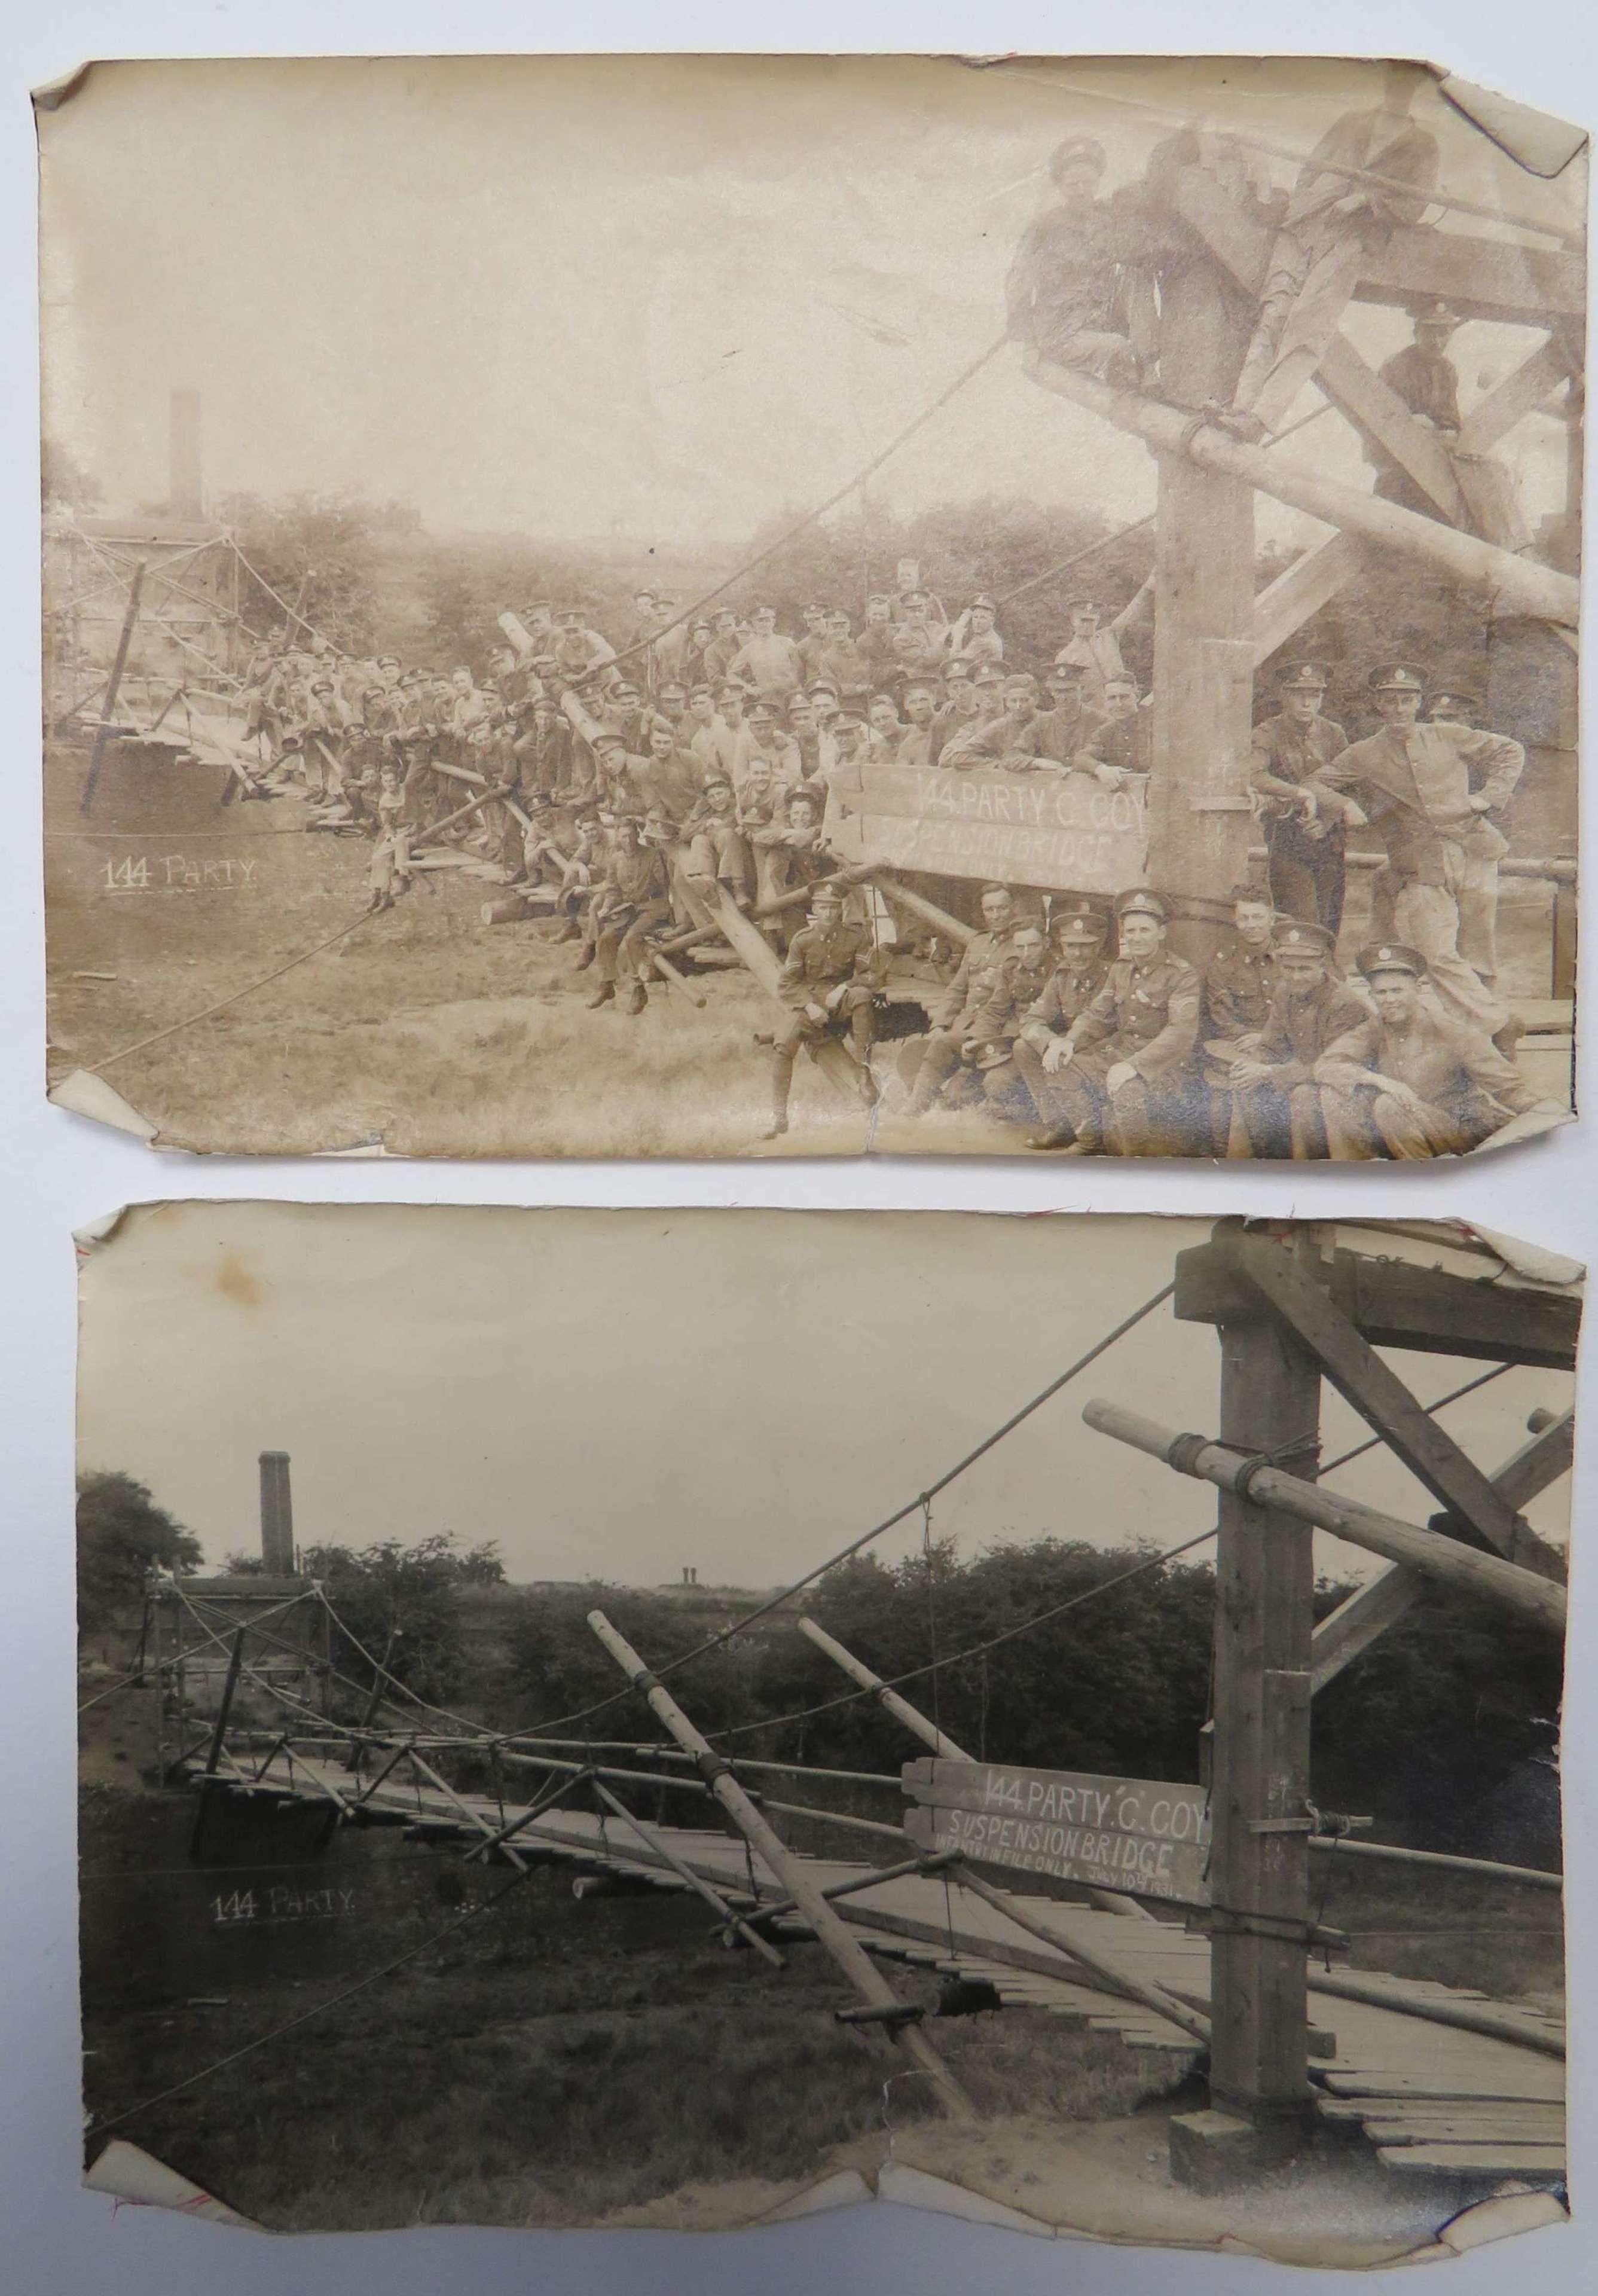 1931 Royal Engineer Bridging Photographs